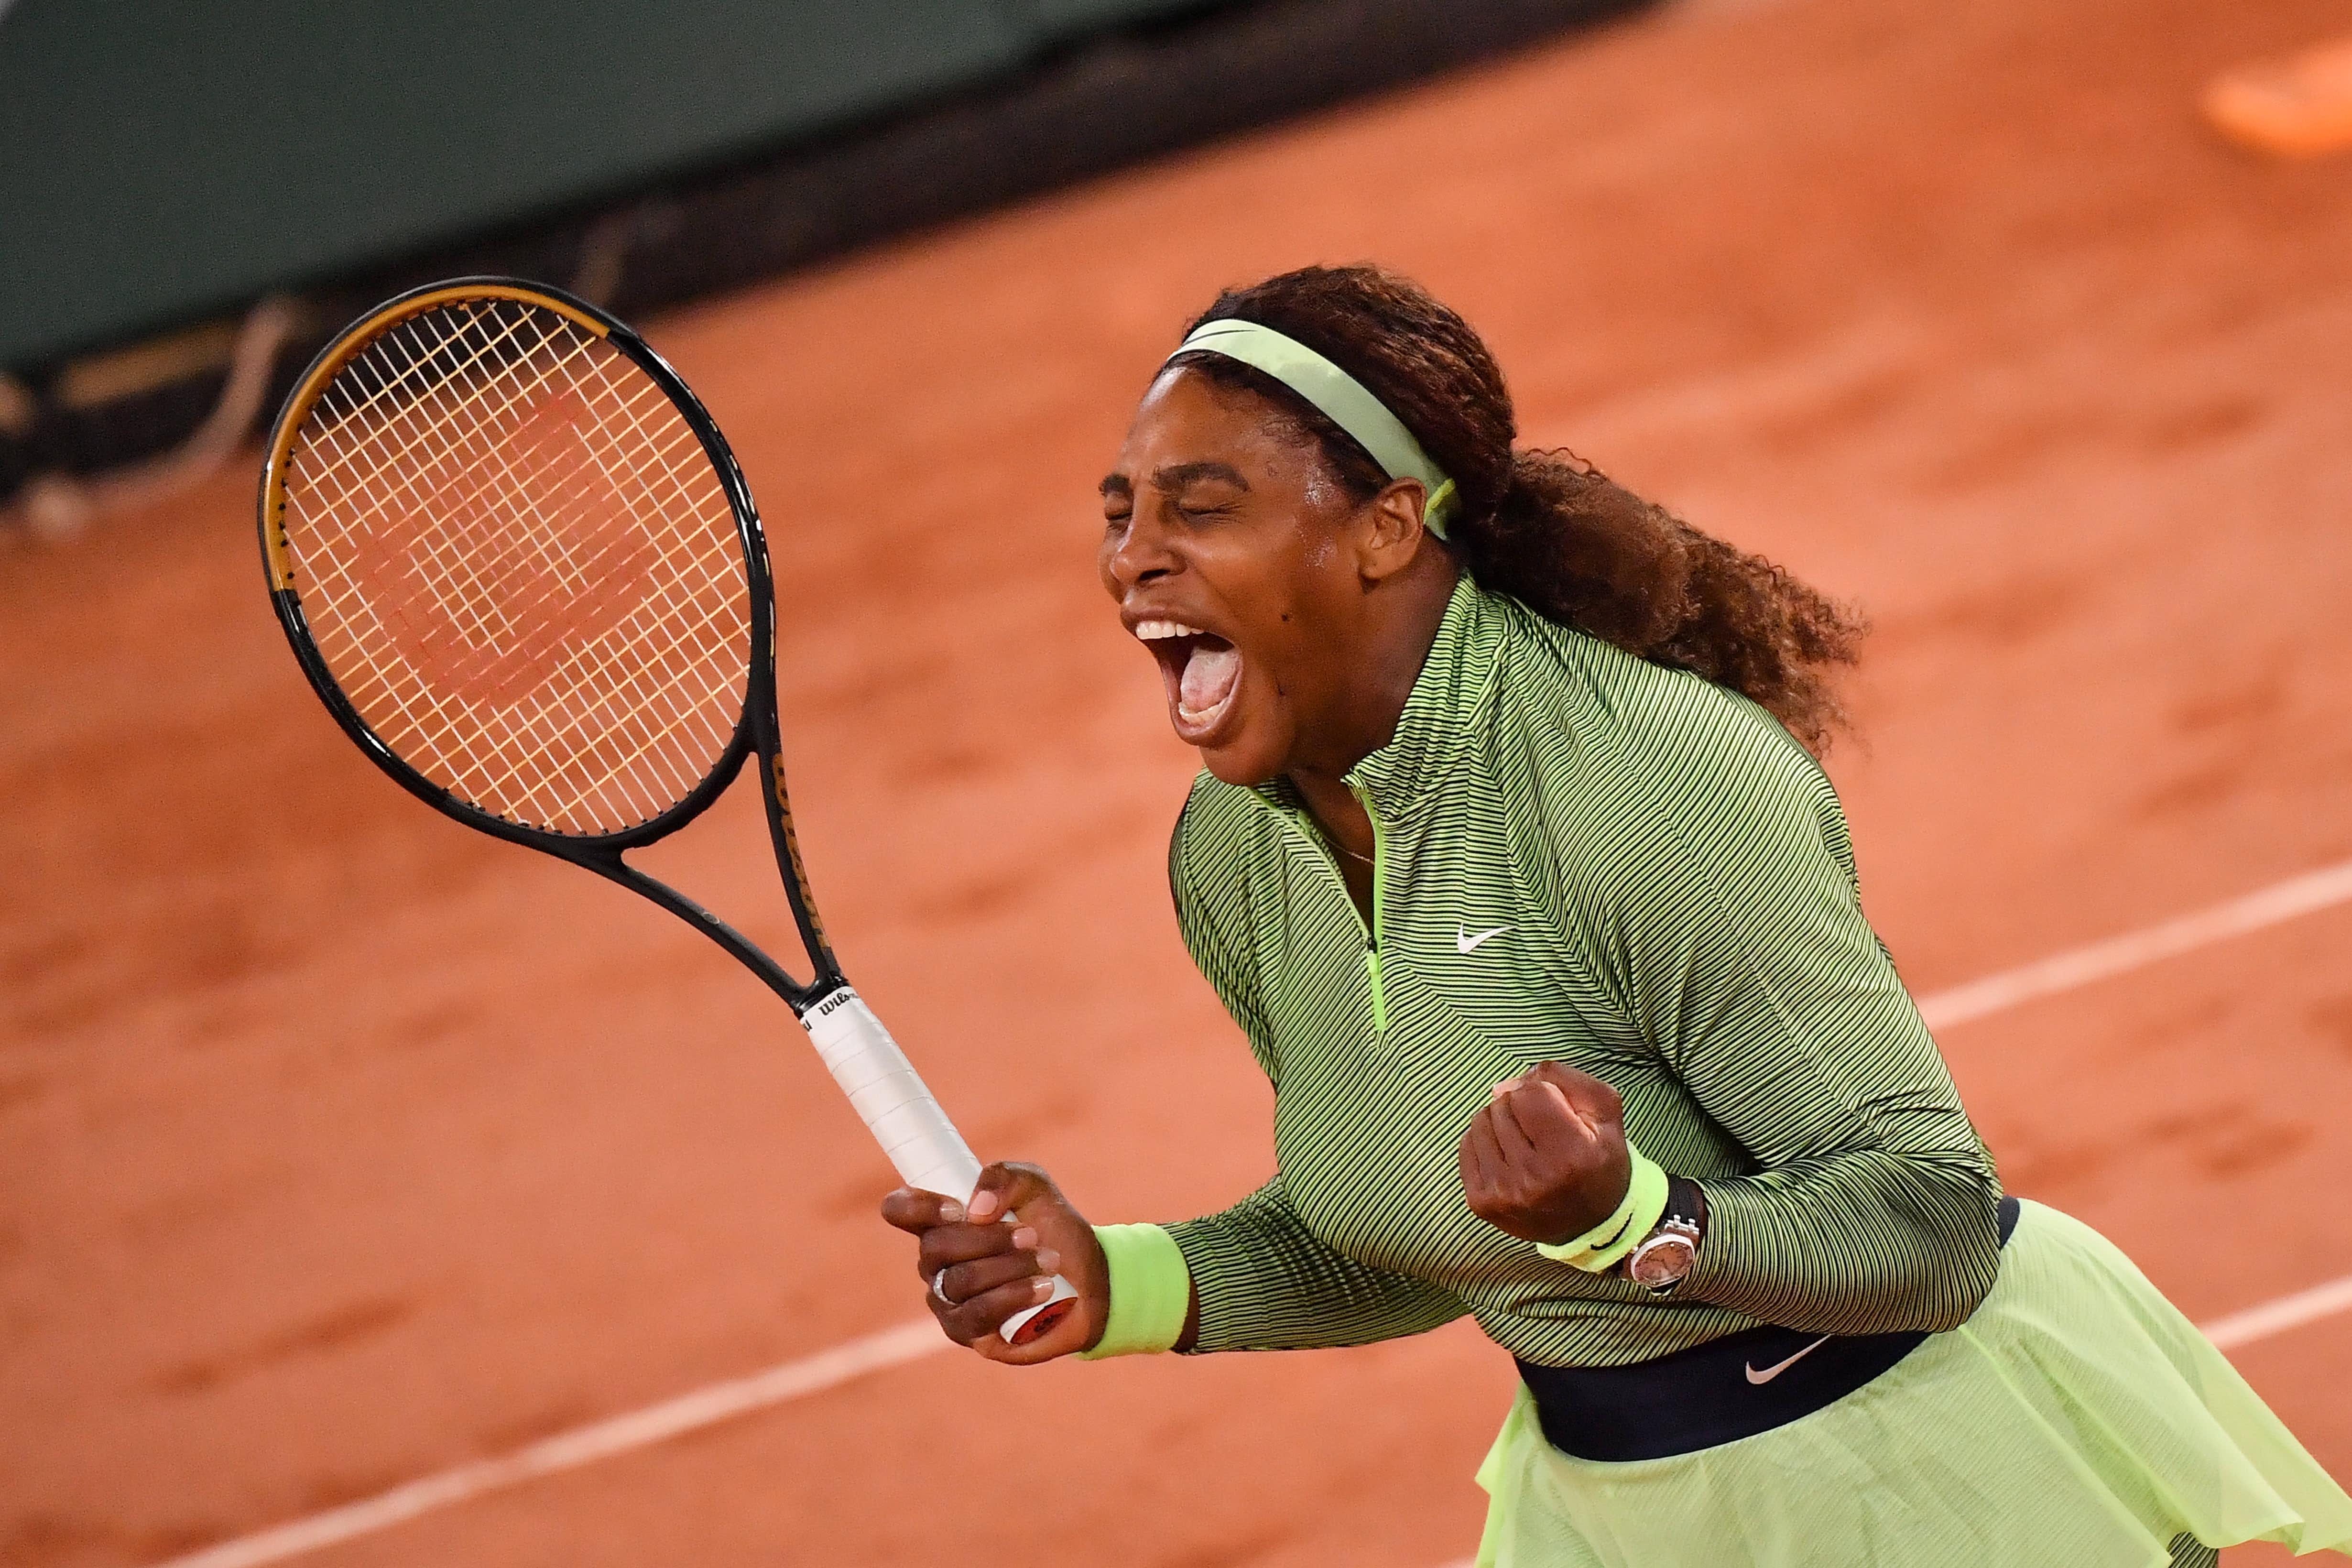 Serena Williams invests in rent-reporting fintech Esusu